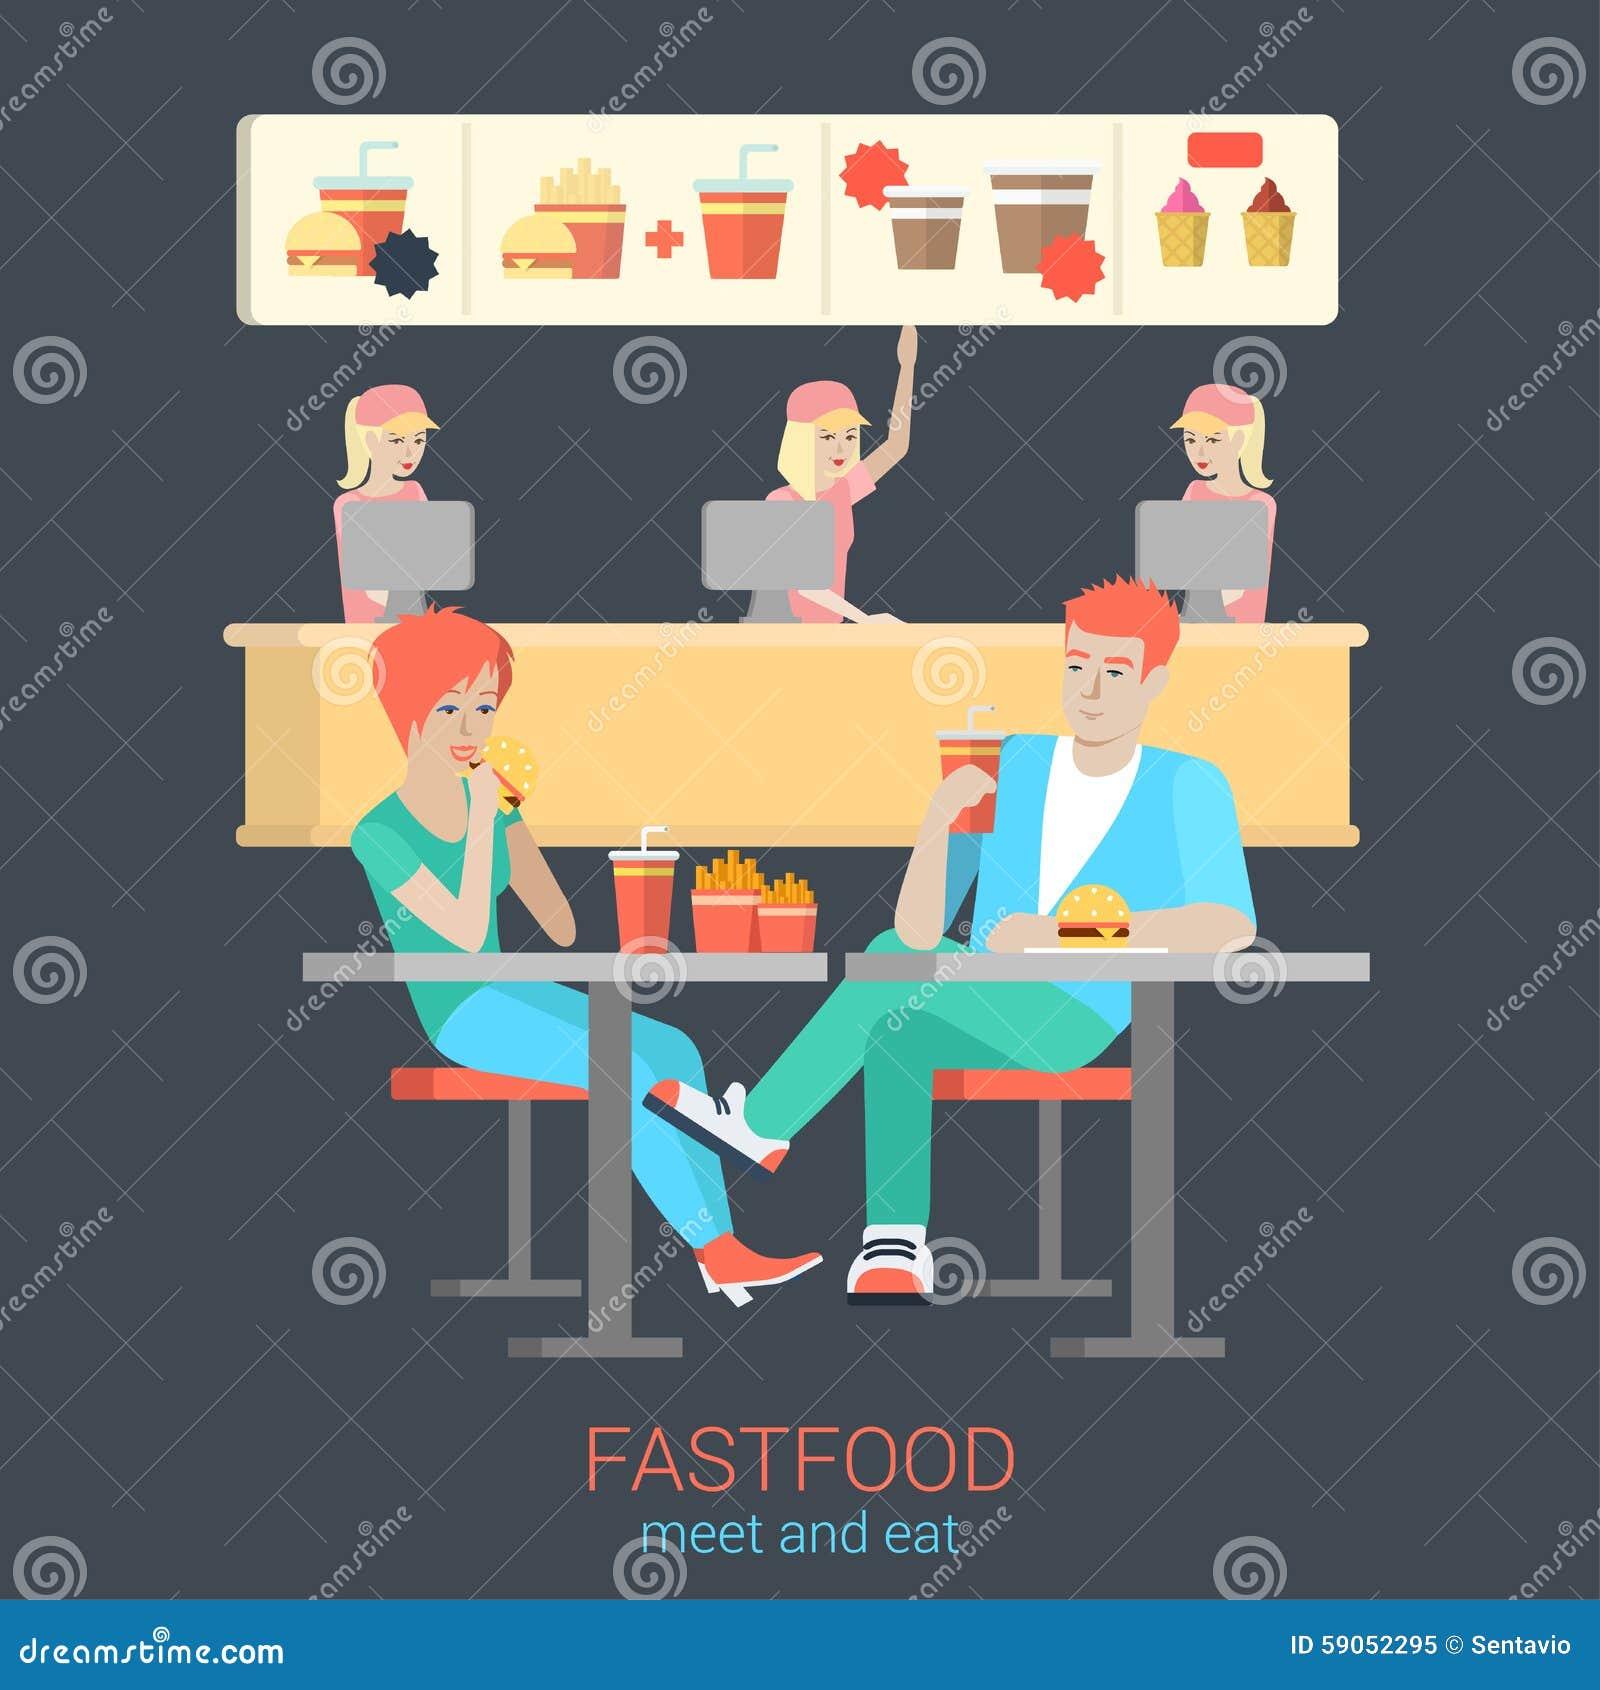 Male Cashier At Fast Food Restaurant Cartoon Vector Cartoondealer Com  65828907